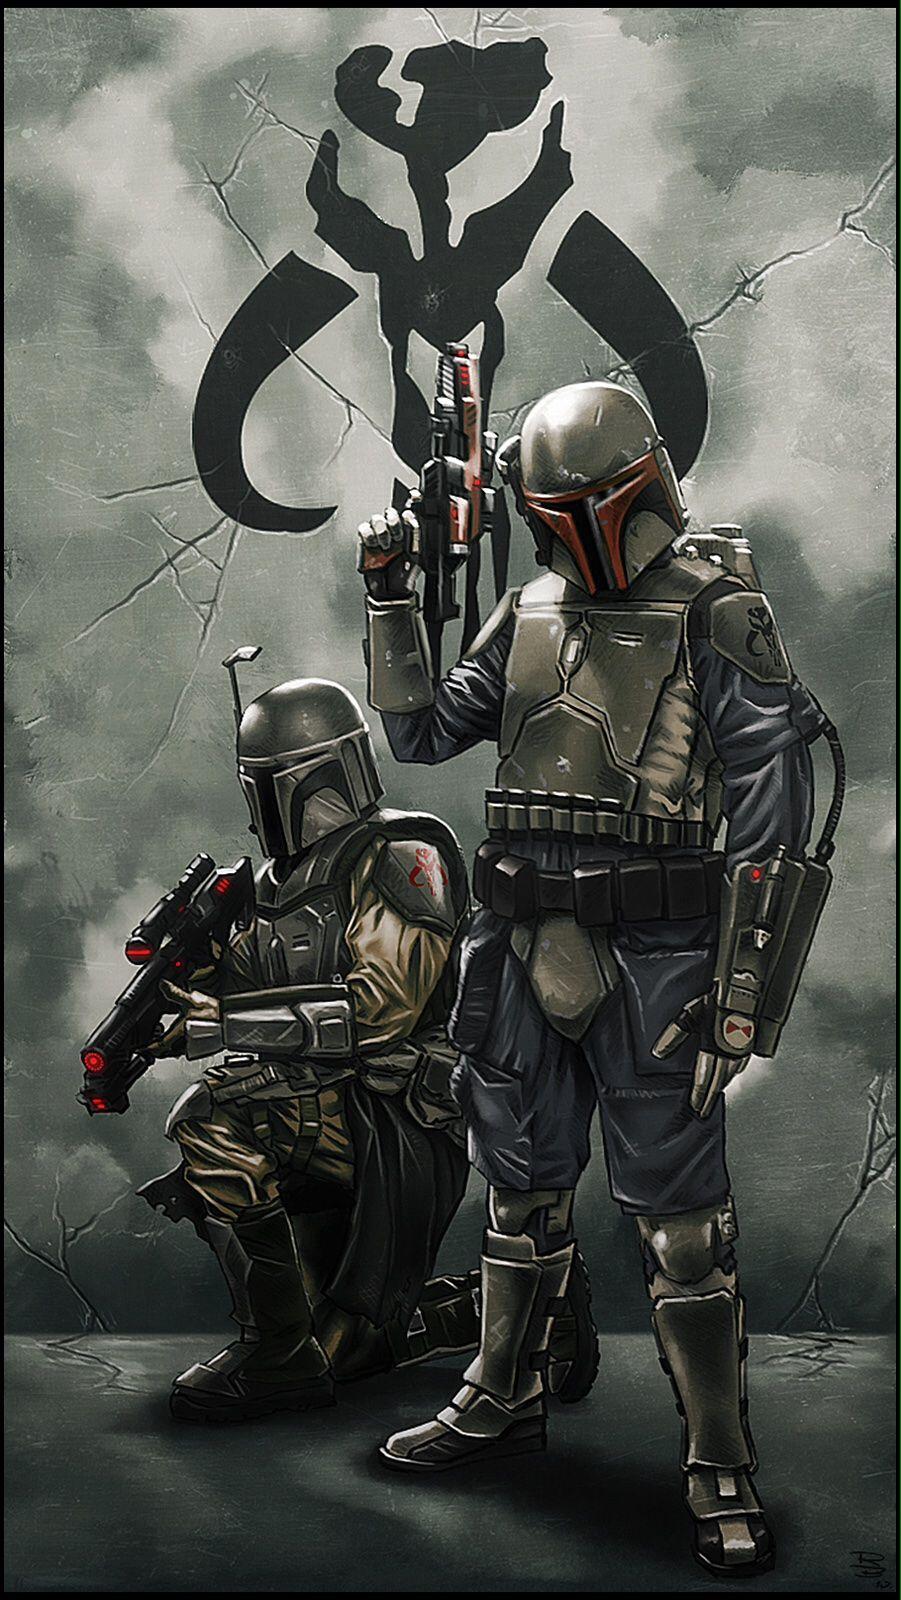 Star Wars Wallpaper Dump Star Wars Art Star Wars Wallpaper Star Wars Artwork